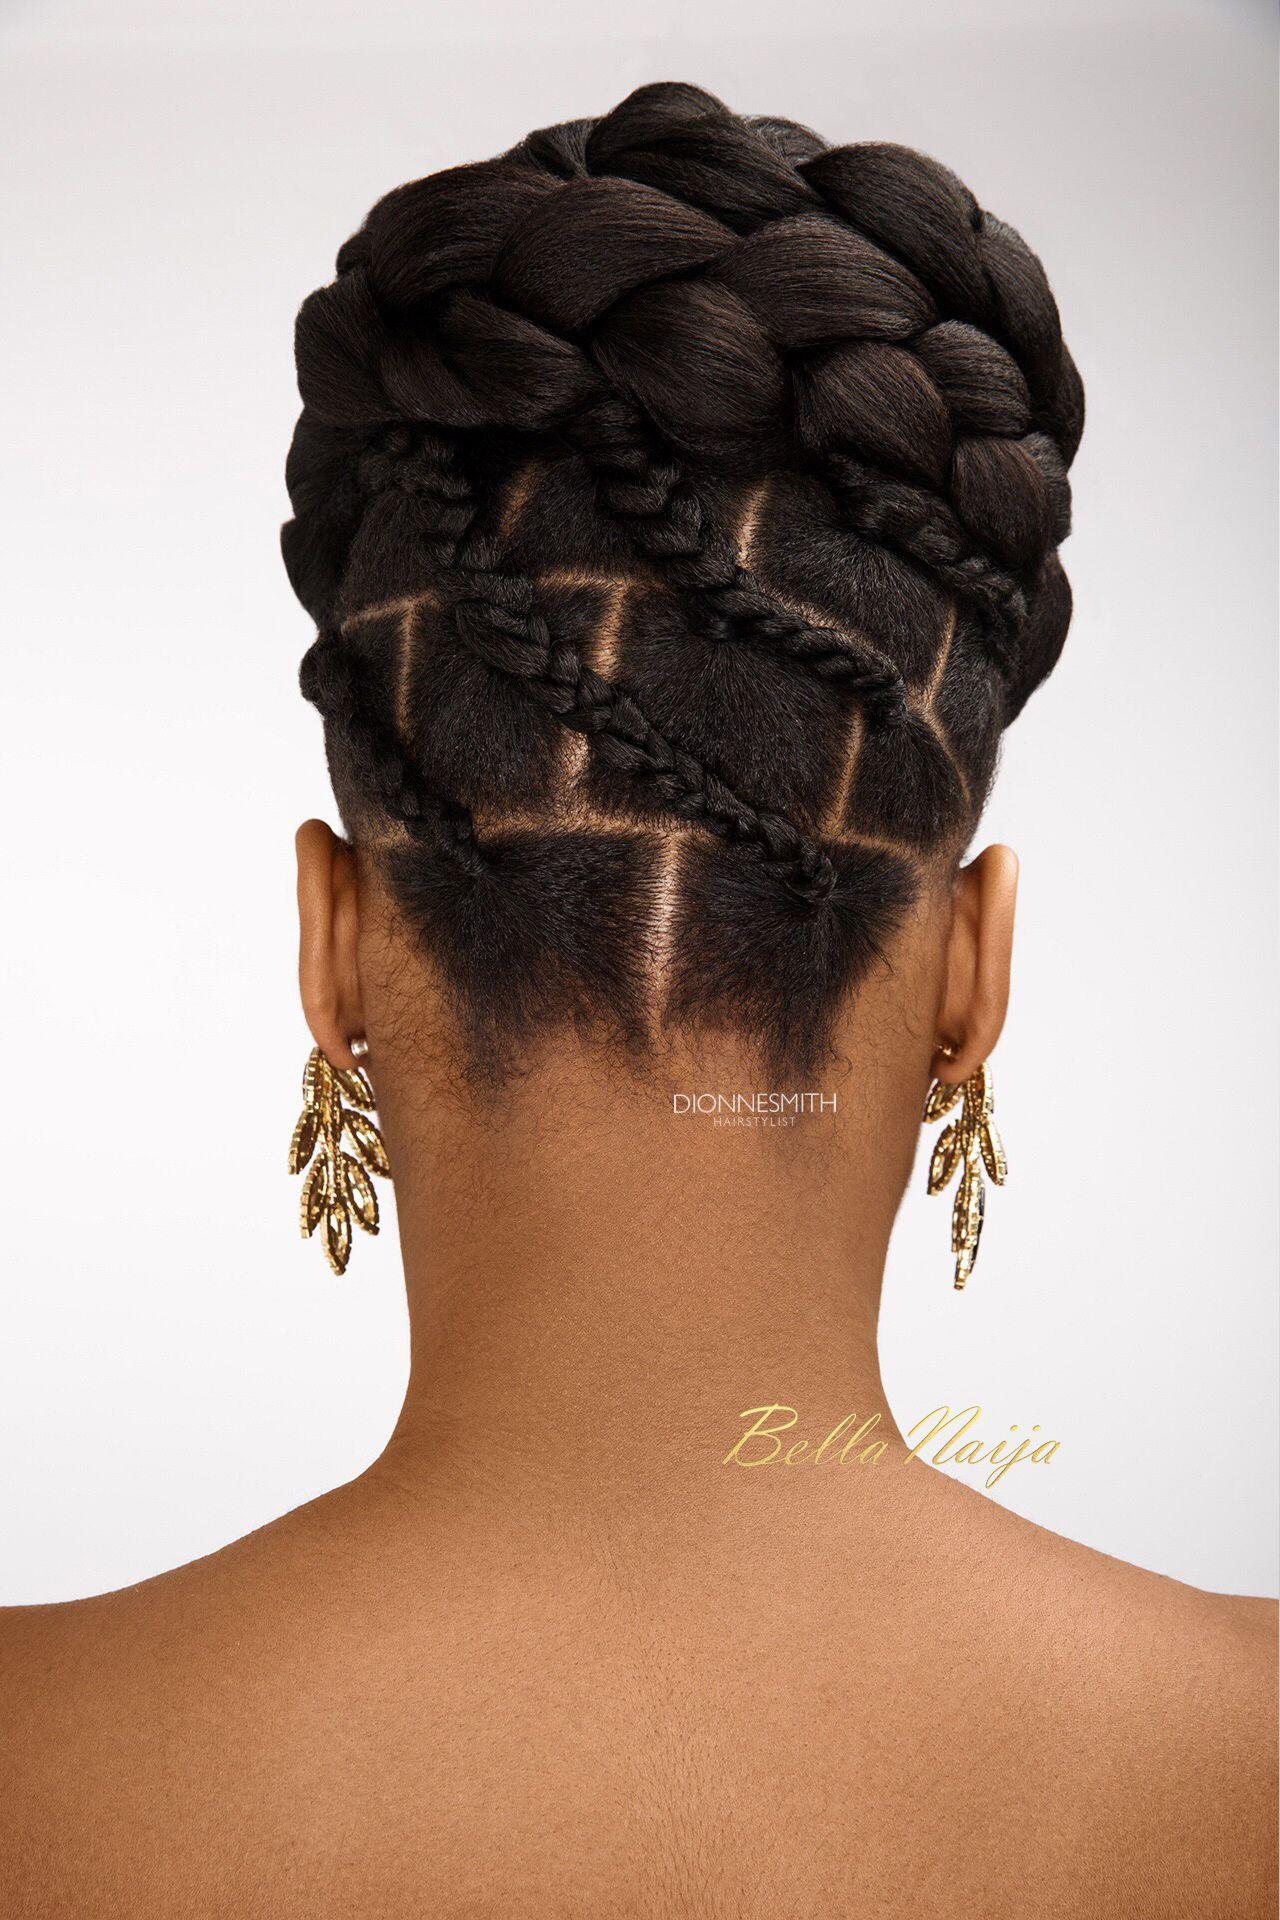 Afro Hairstyles hairstyleforblackwomen.net 40